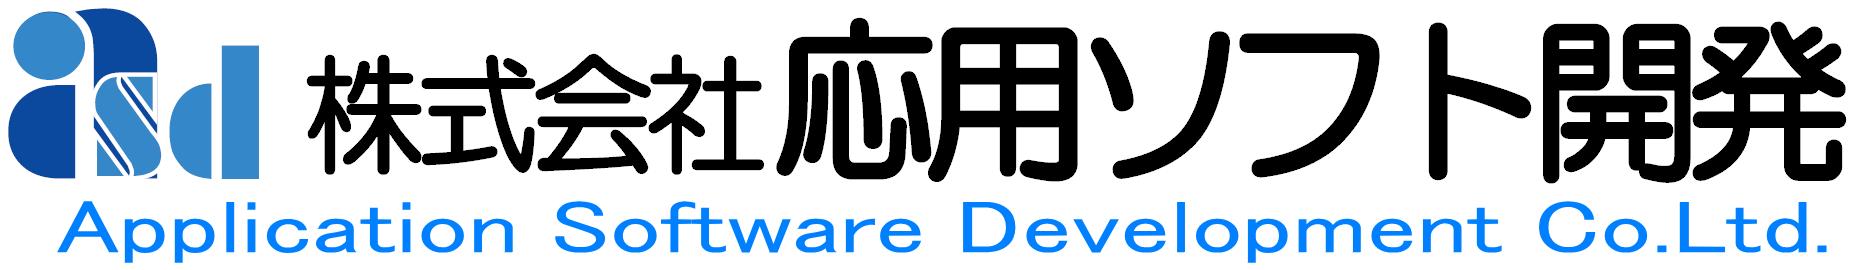 株式会社応用ソフト開発